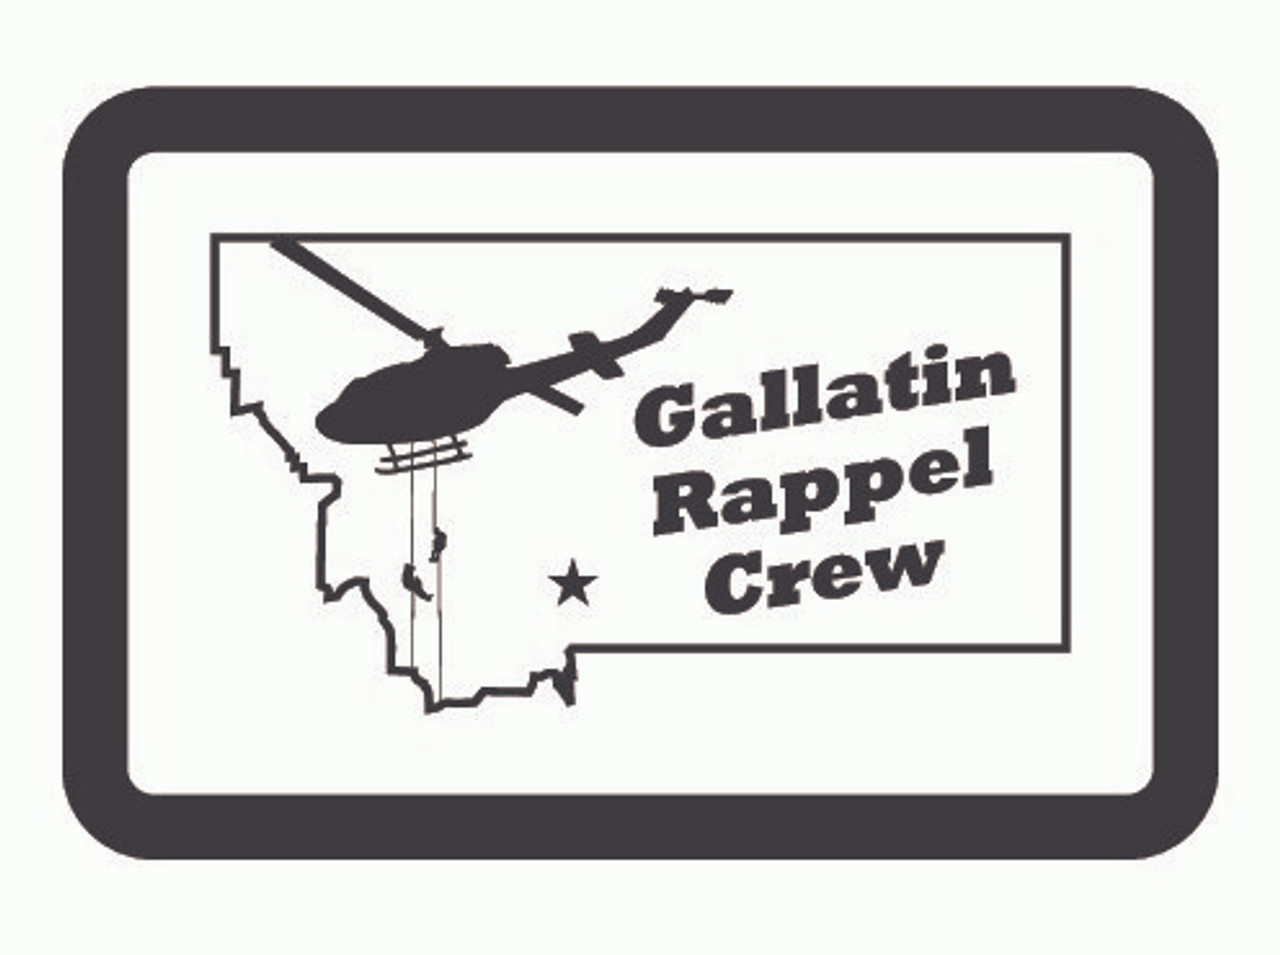 Gallatin Rappel Crew Buckle (RESTRICTED)